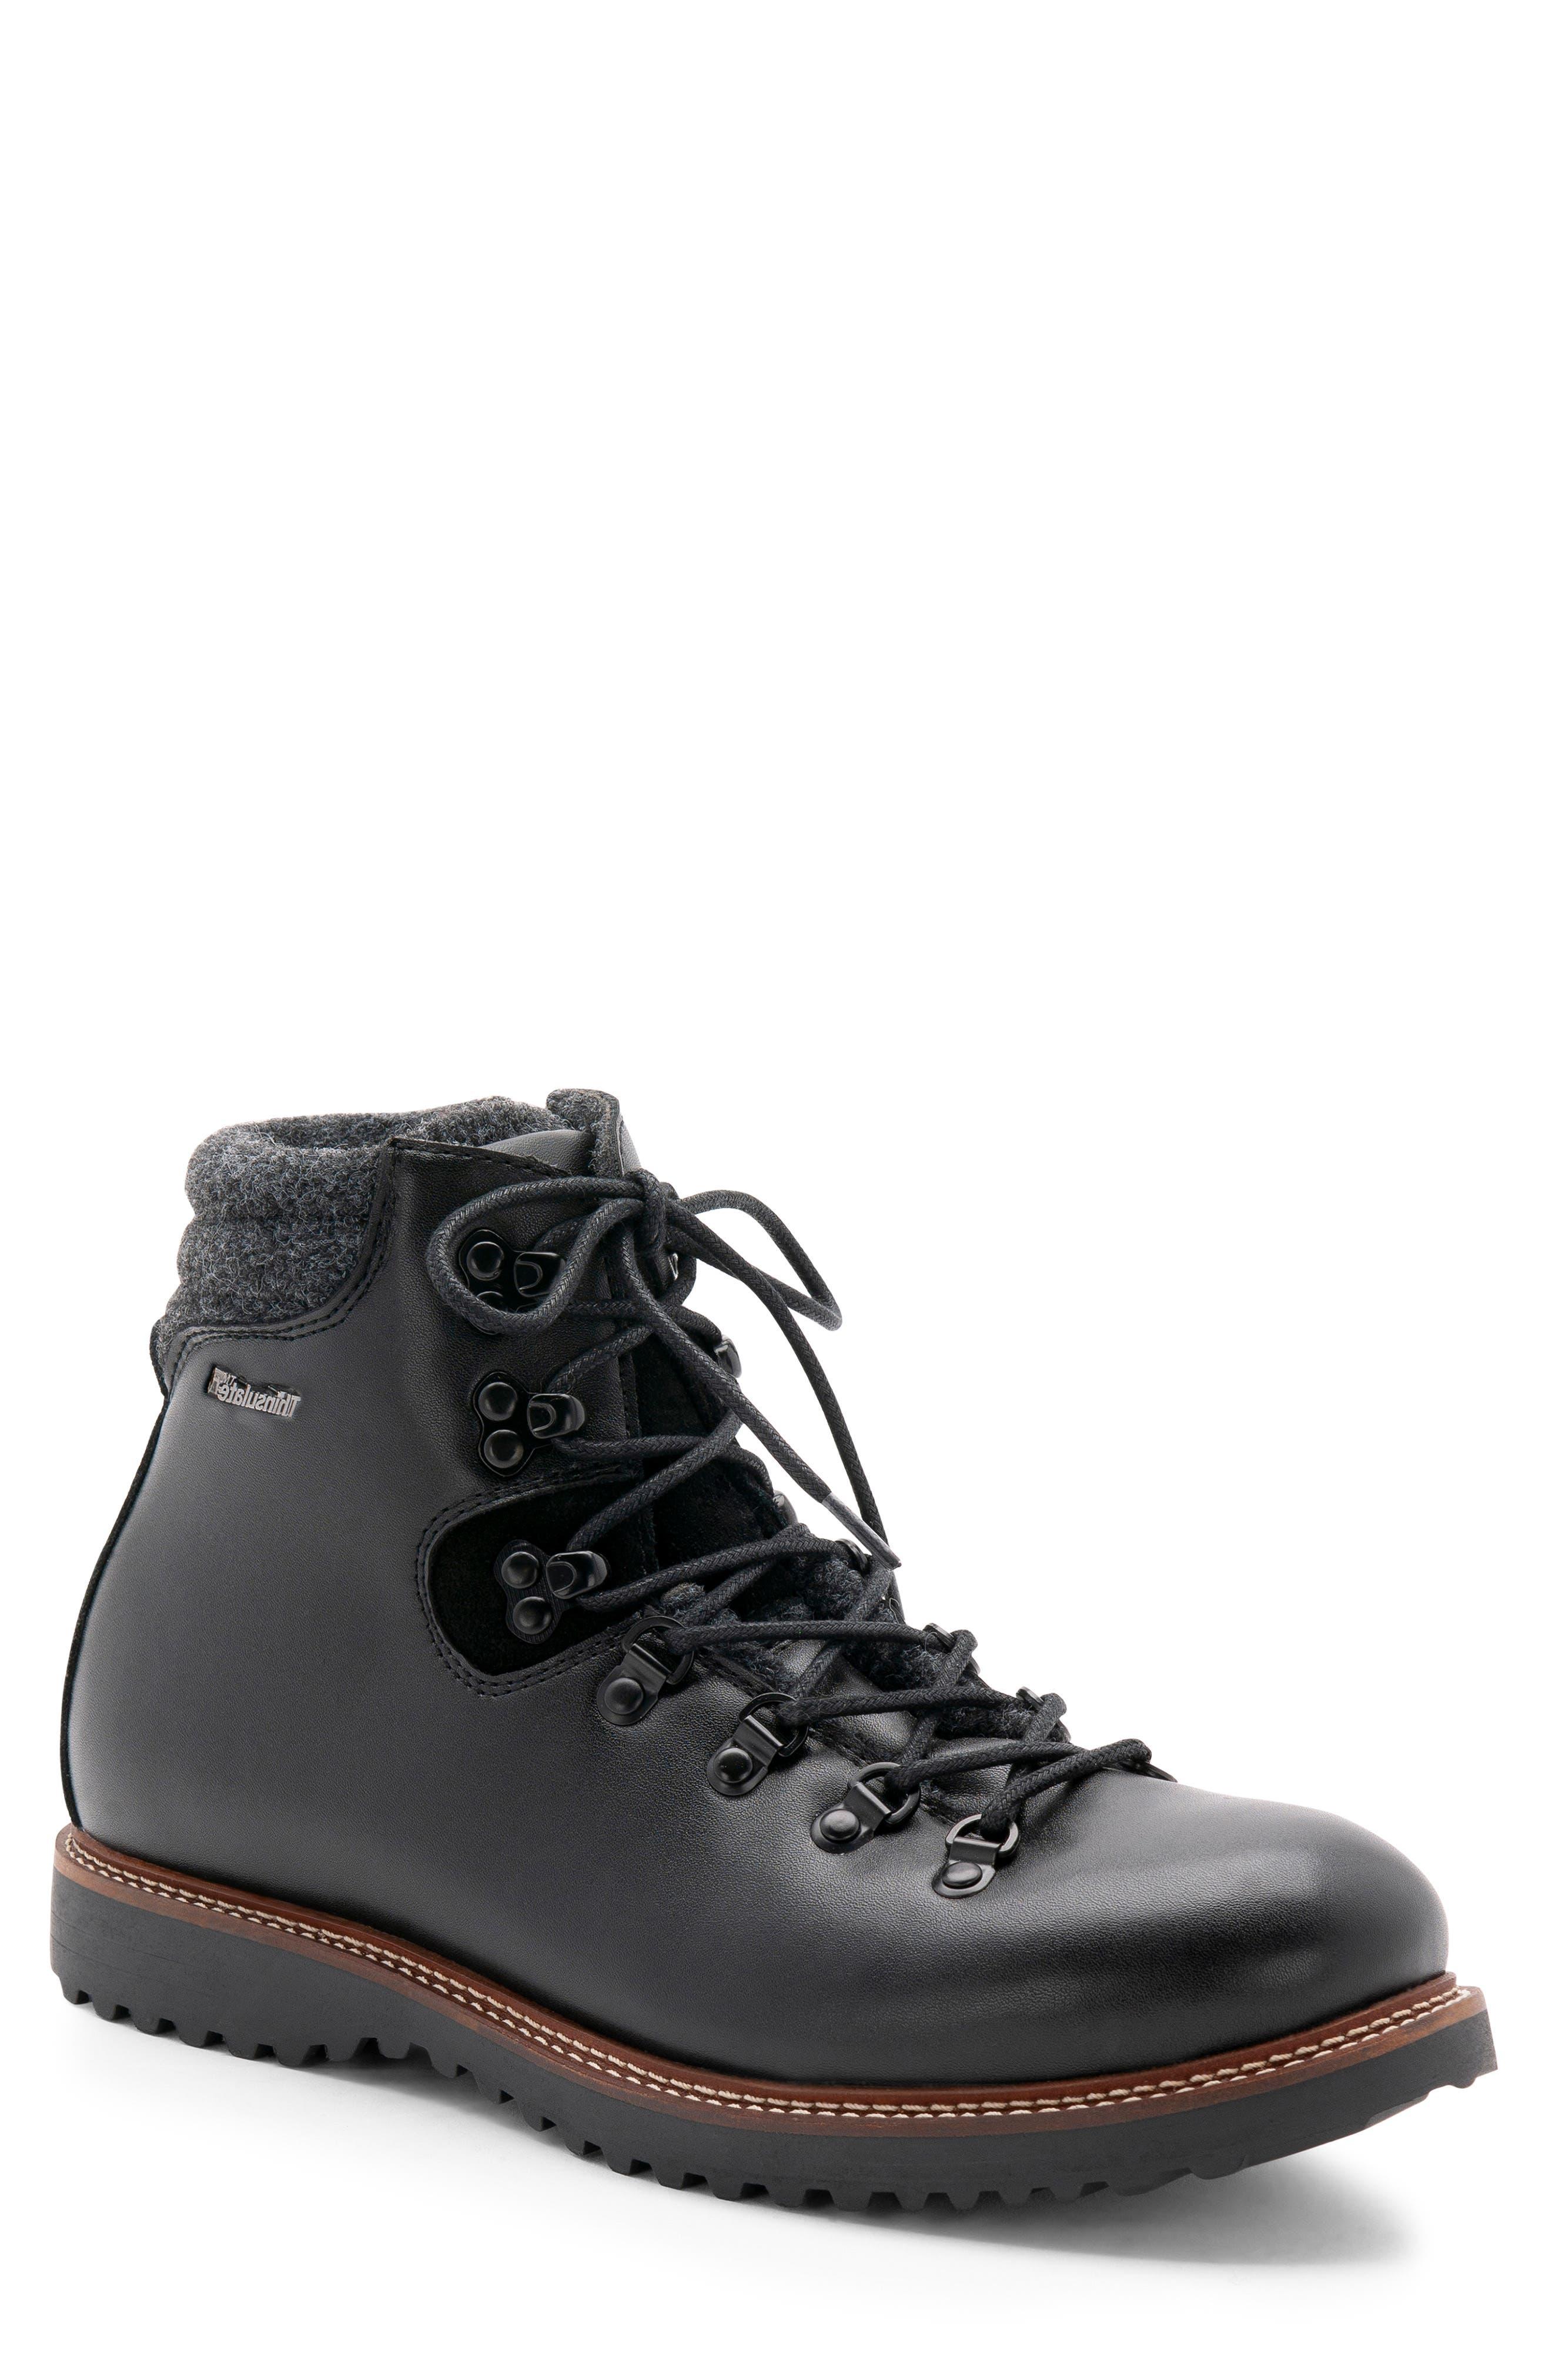 Morgan Waterproof Plain Toe Boot,                         Main,                         color, BLACK LEATHER